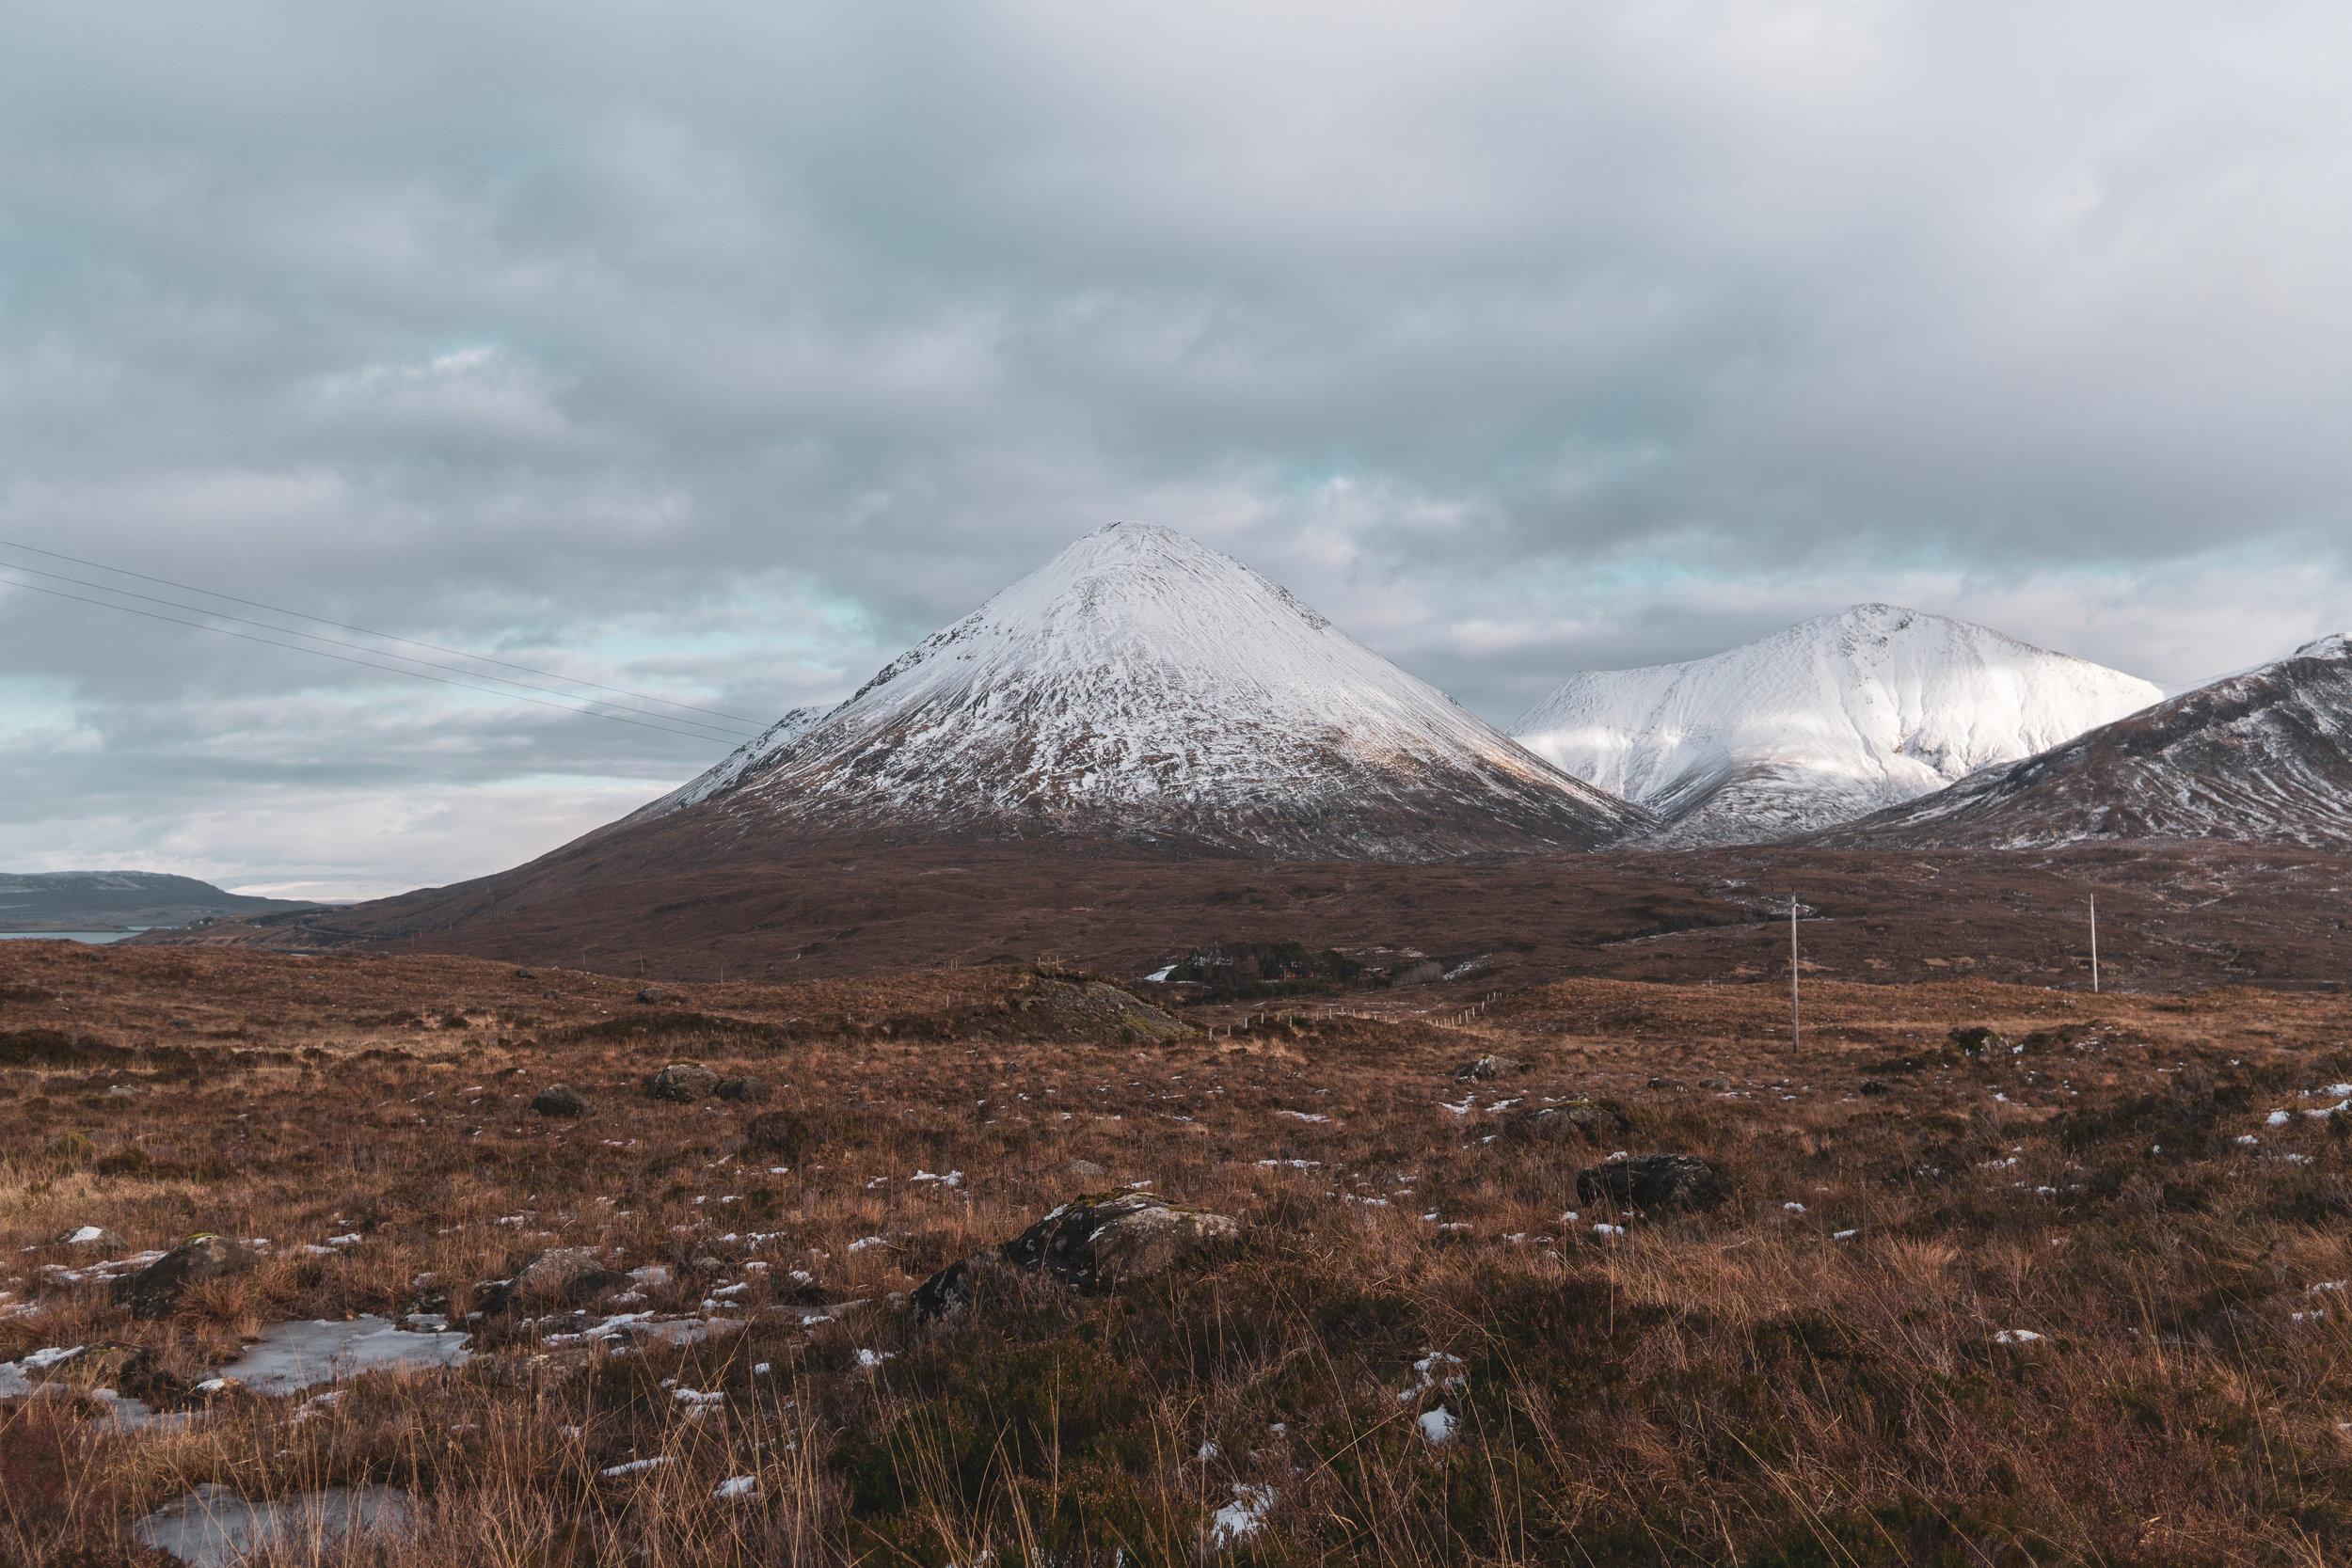 Isle-of-Skye-Fairy-Glen-und-Braes (32).jpg